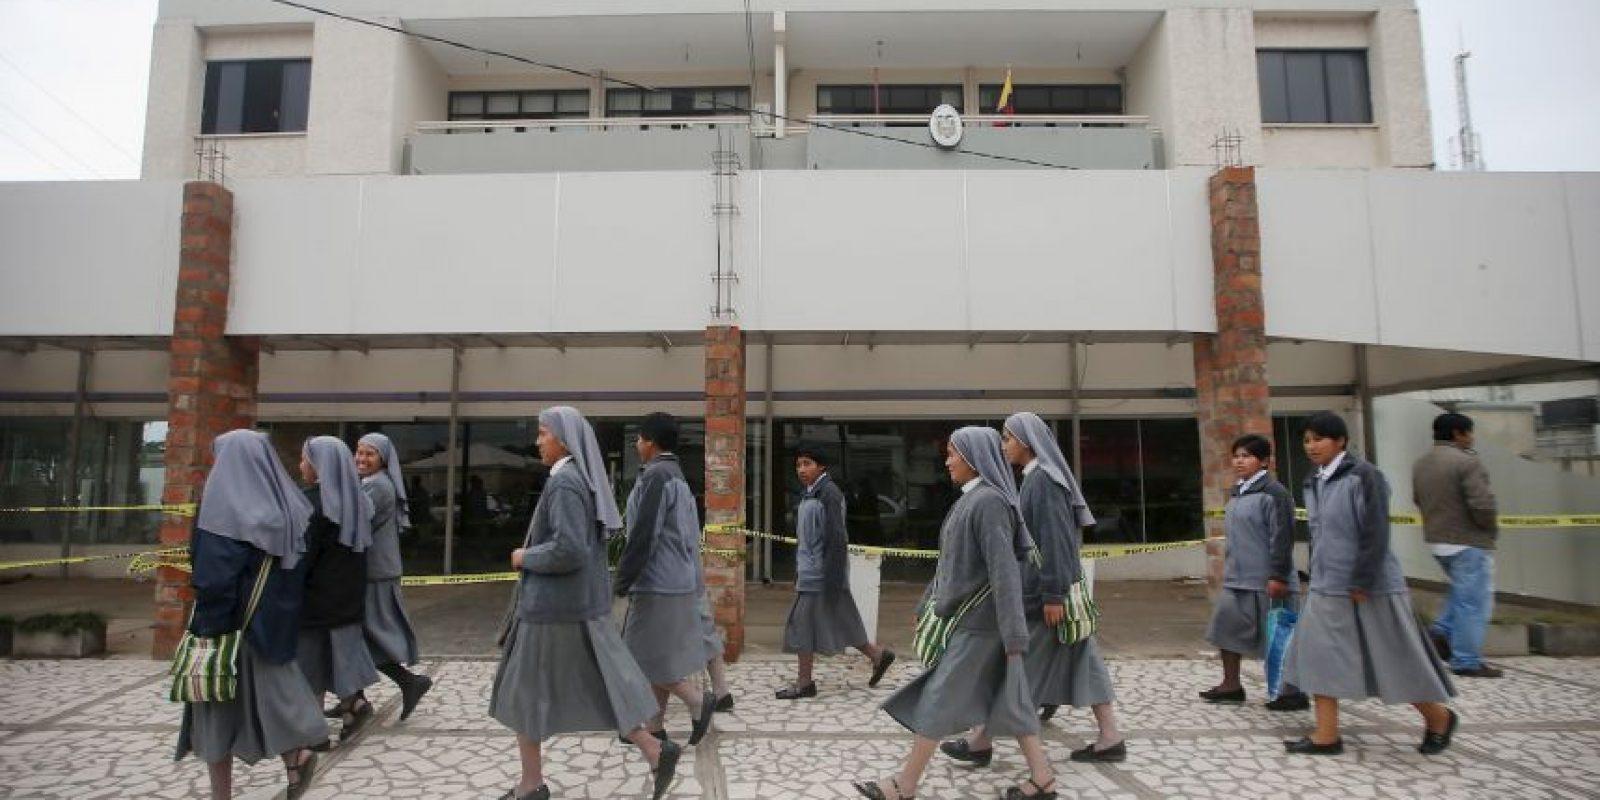 El orfanato formaba parte de la Iglesia Católica. Foto:Getty Images